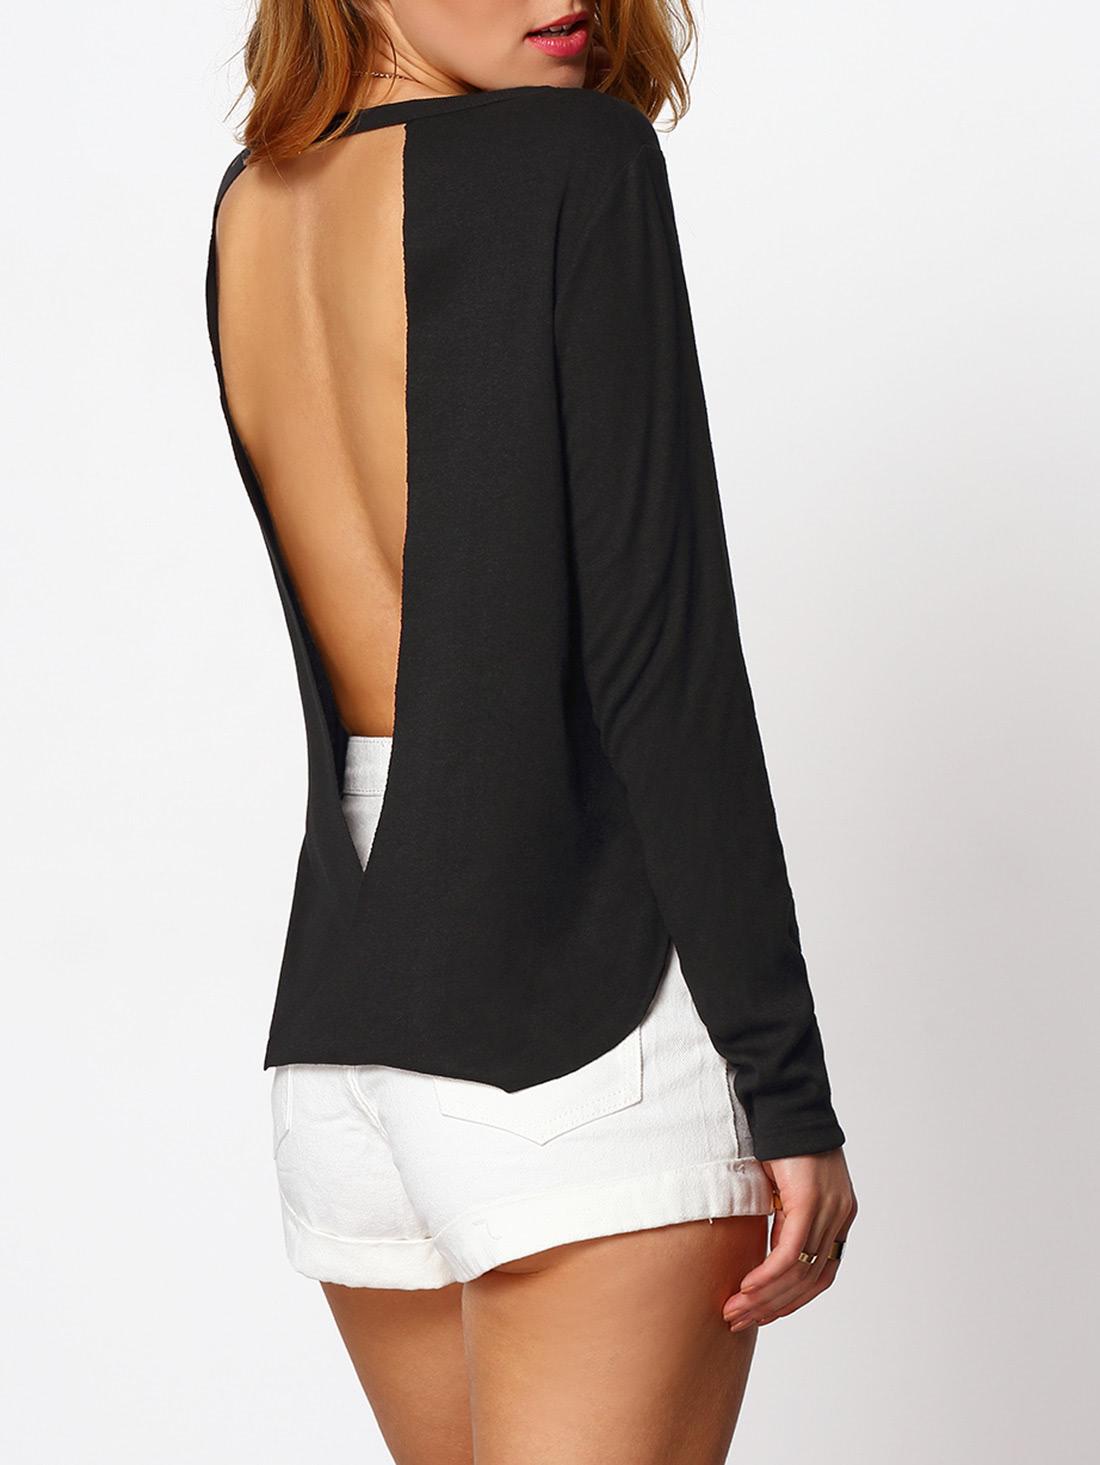 Split Side Cut Out Backless Blouse blouse160307505